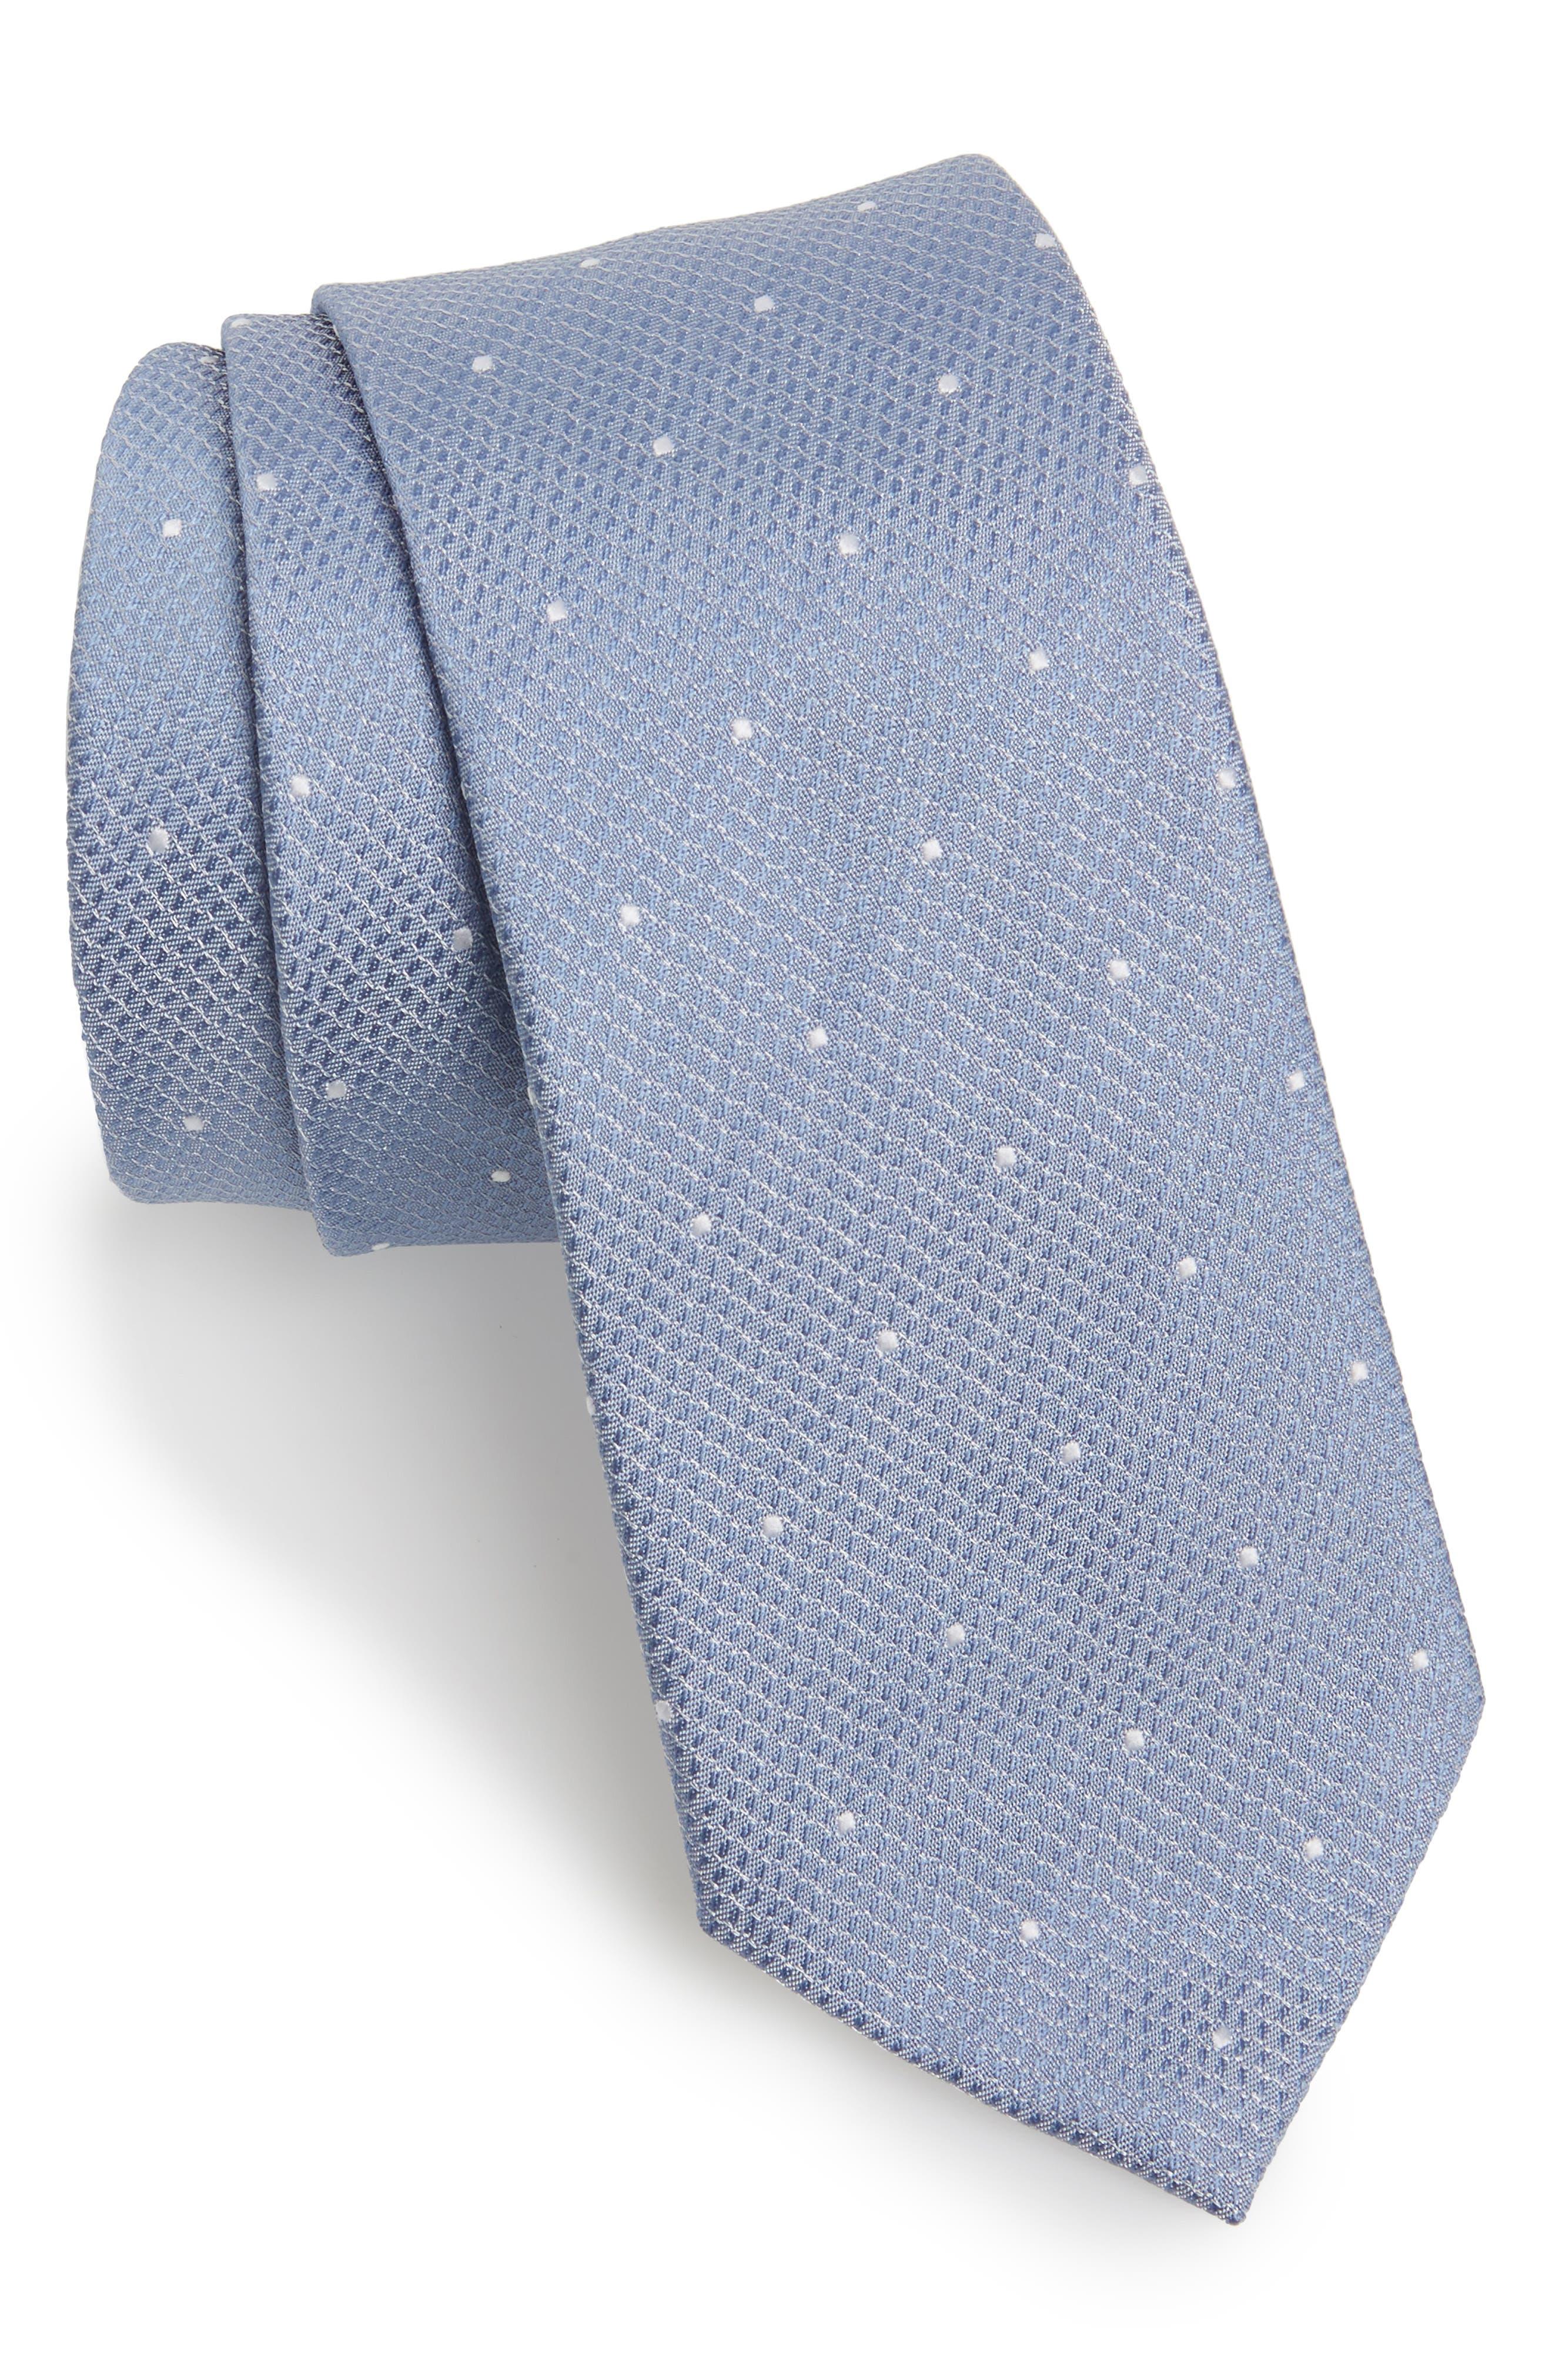 Dot Woven Tie,                         Main,                         color,